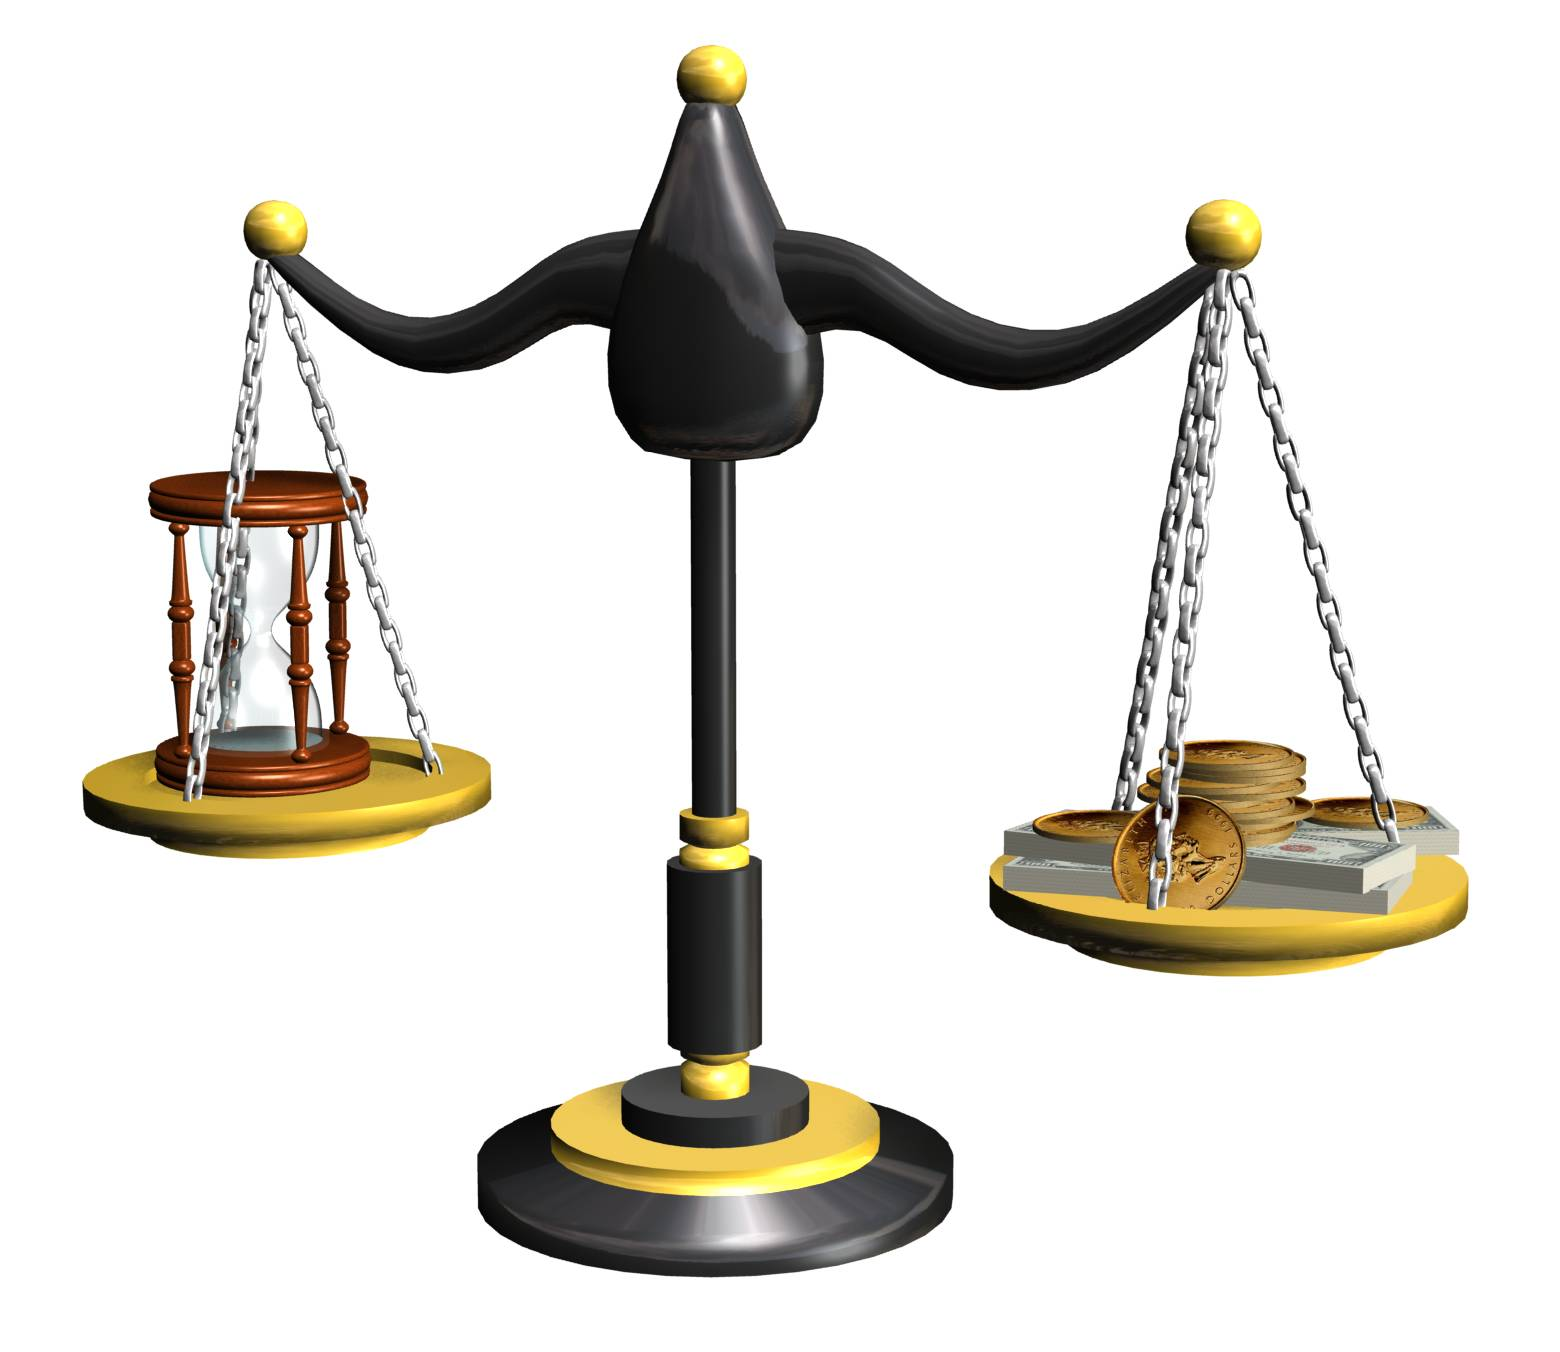 Checks and balances clipart graphic free Checks And Balances Diagram image tips graphic free